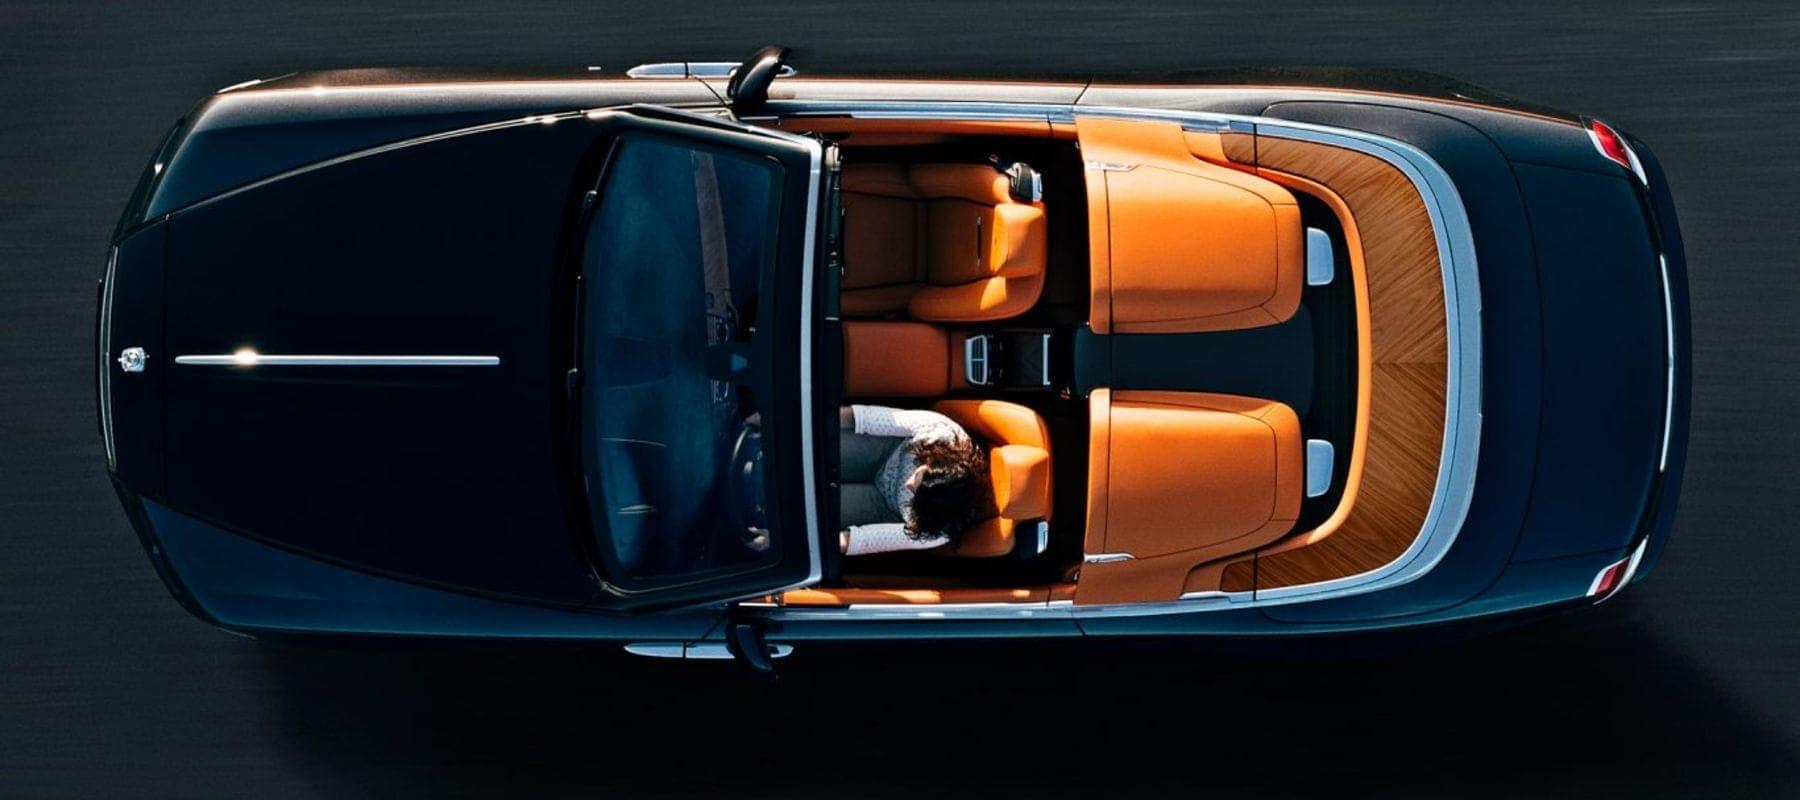 2019 Rolls Royce DAWN 08_4-3-sml-grid_v1-6jpgrr1366MEDjpg